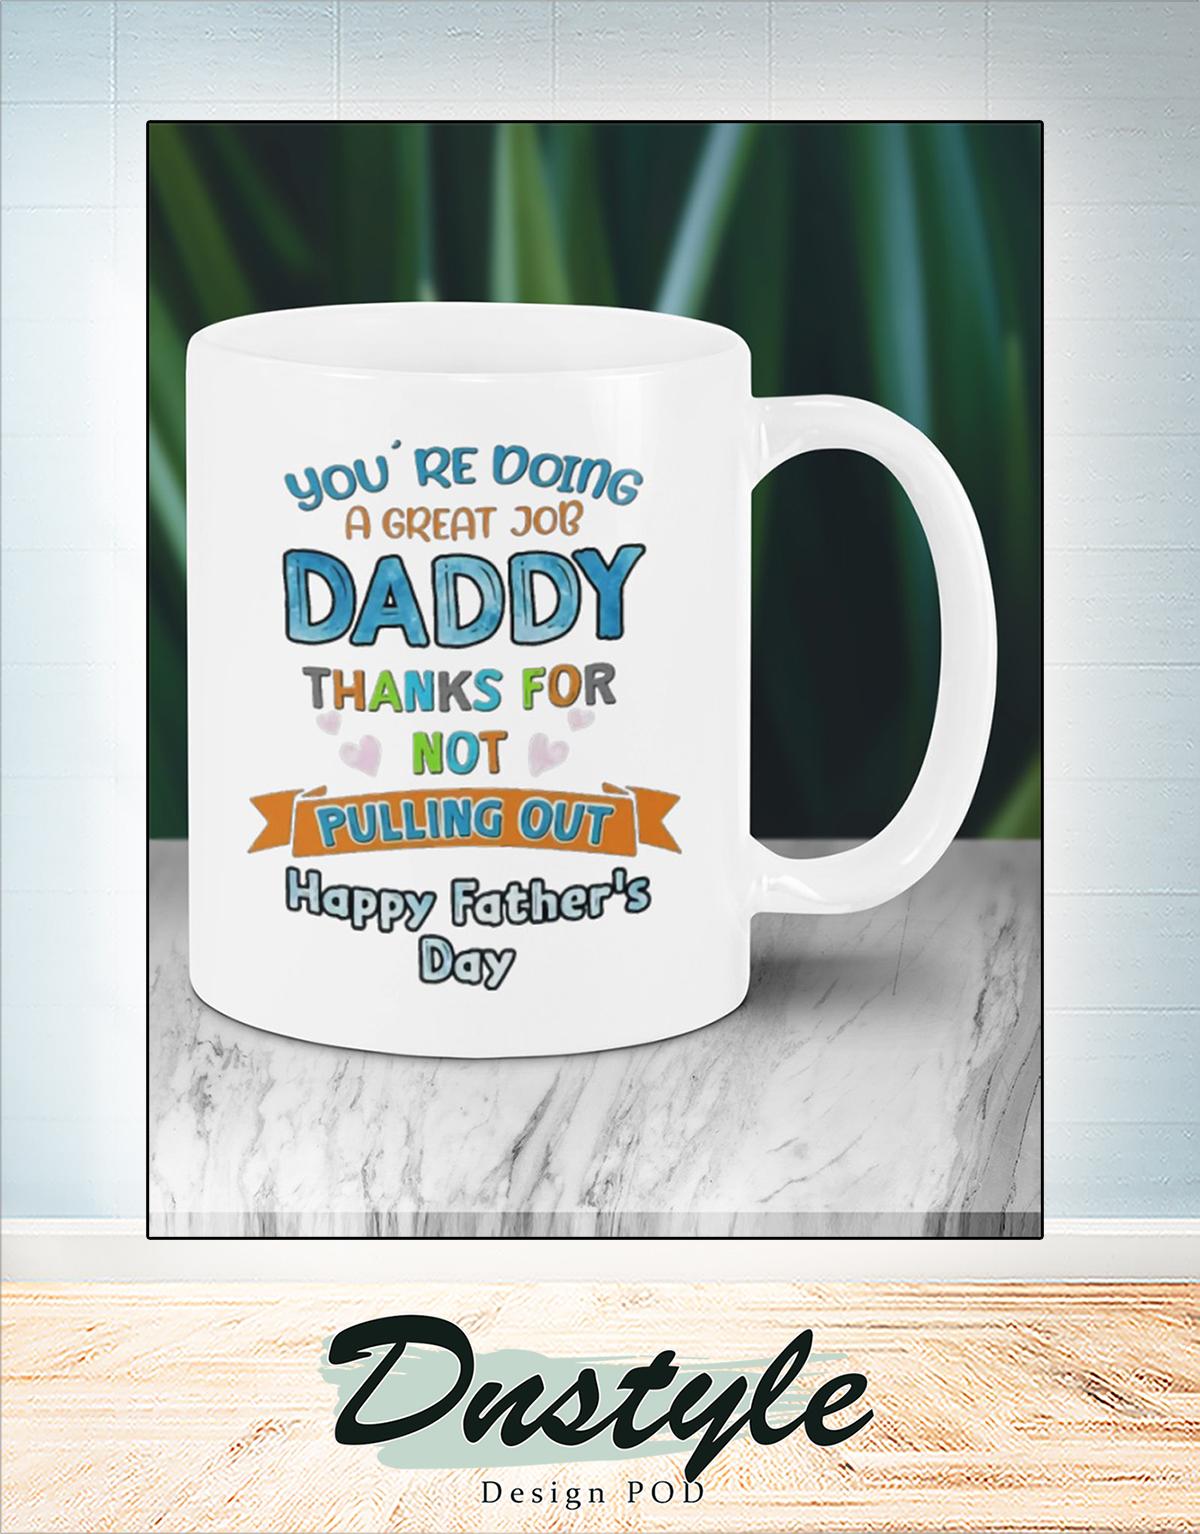 You're doing a great job daddy mug 1